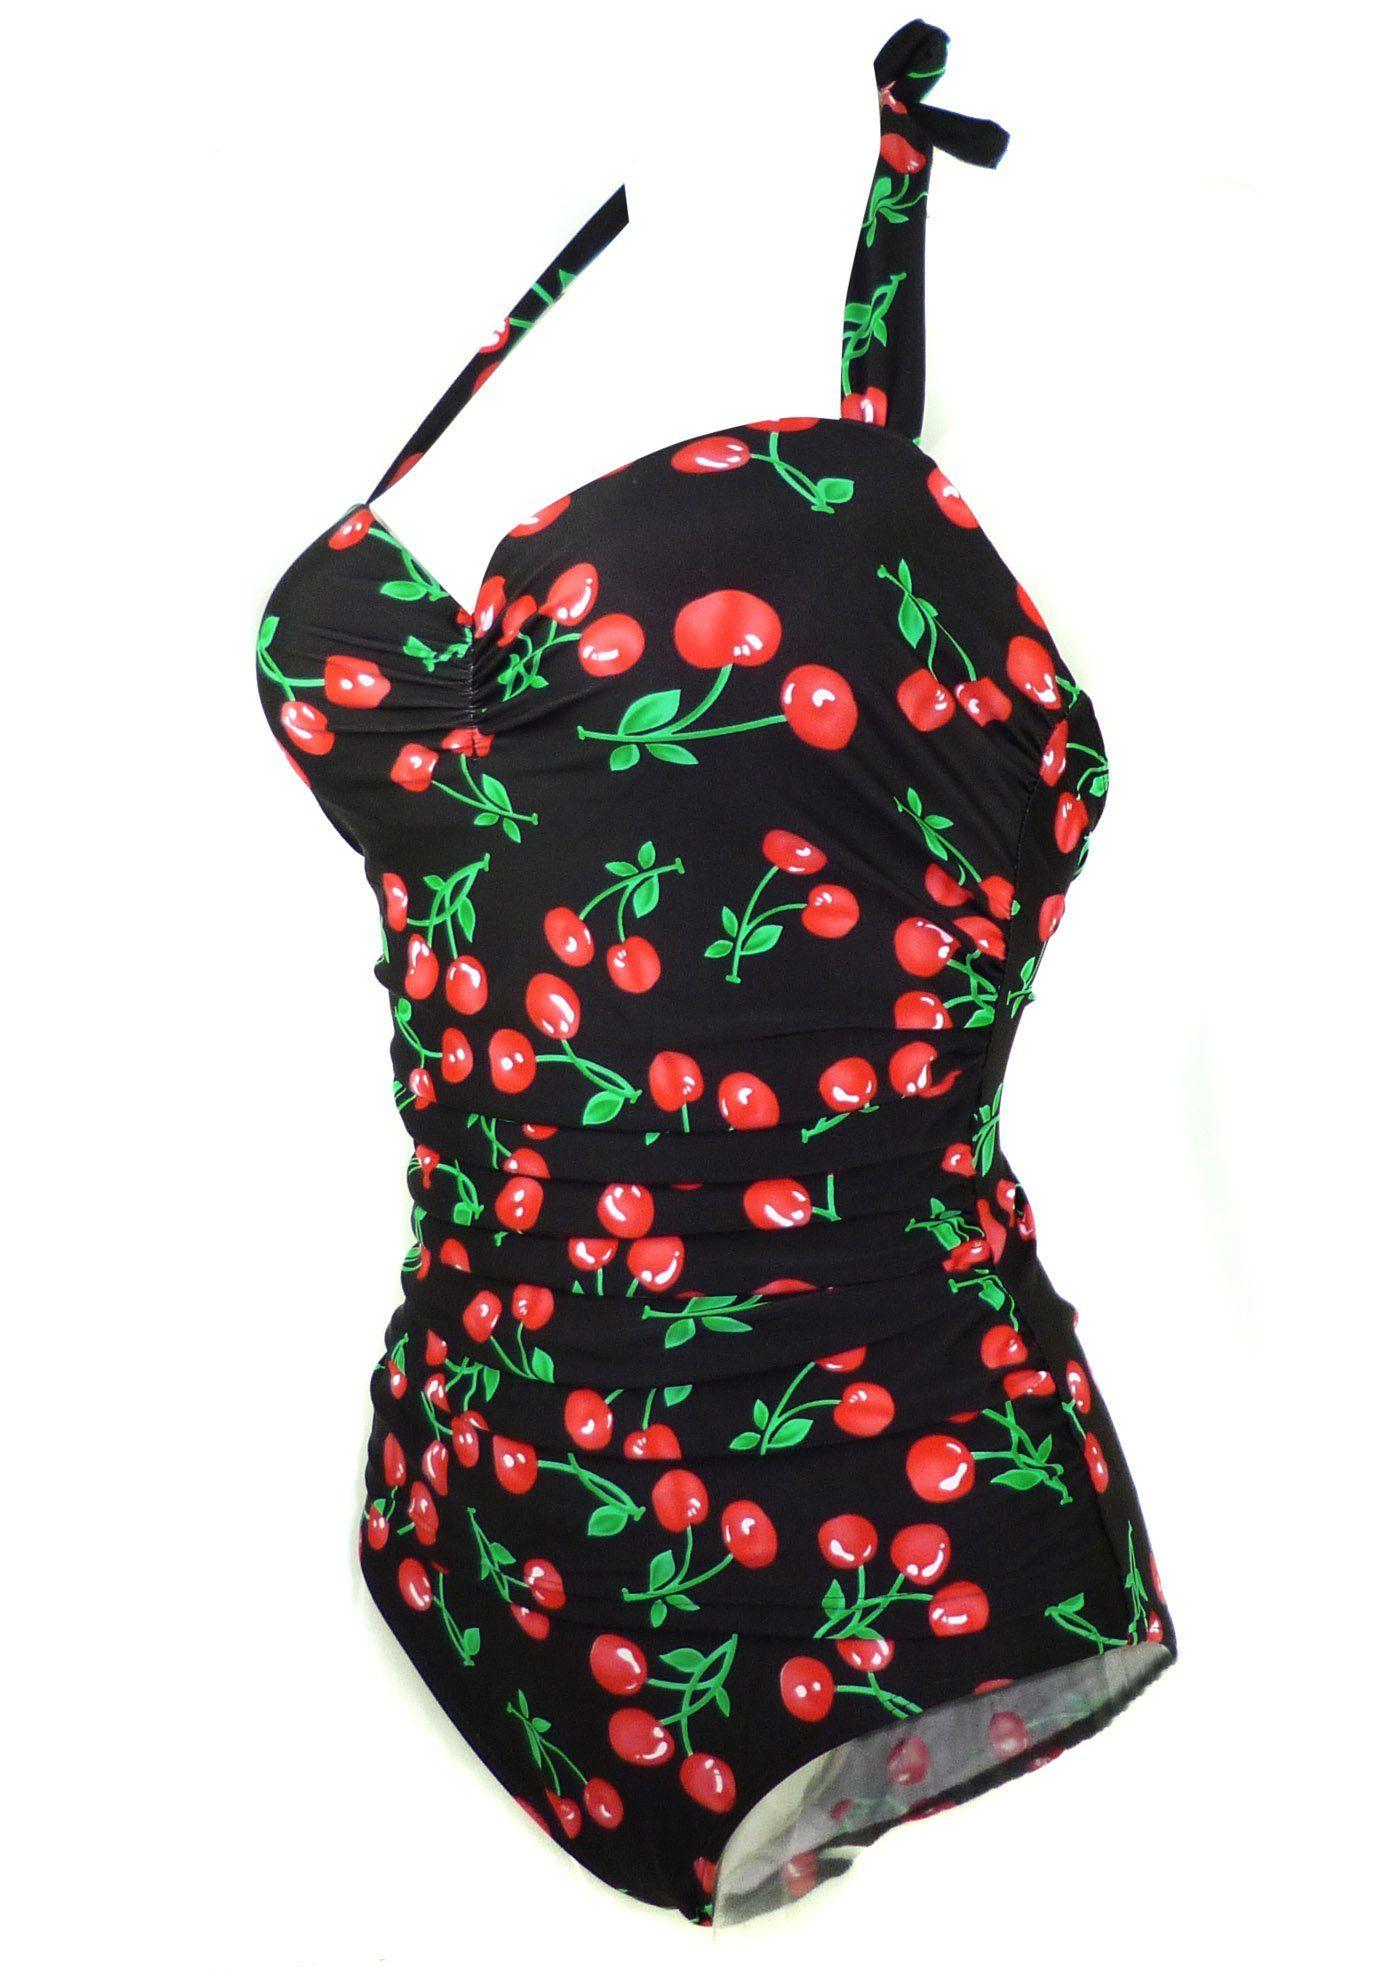 8c1750bca6 Amazon.com  Cocoship 50s Retro Vintage Flora Print White Polka One Piece  Swimwear Monokinis(FBA)  Clothing